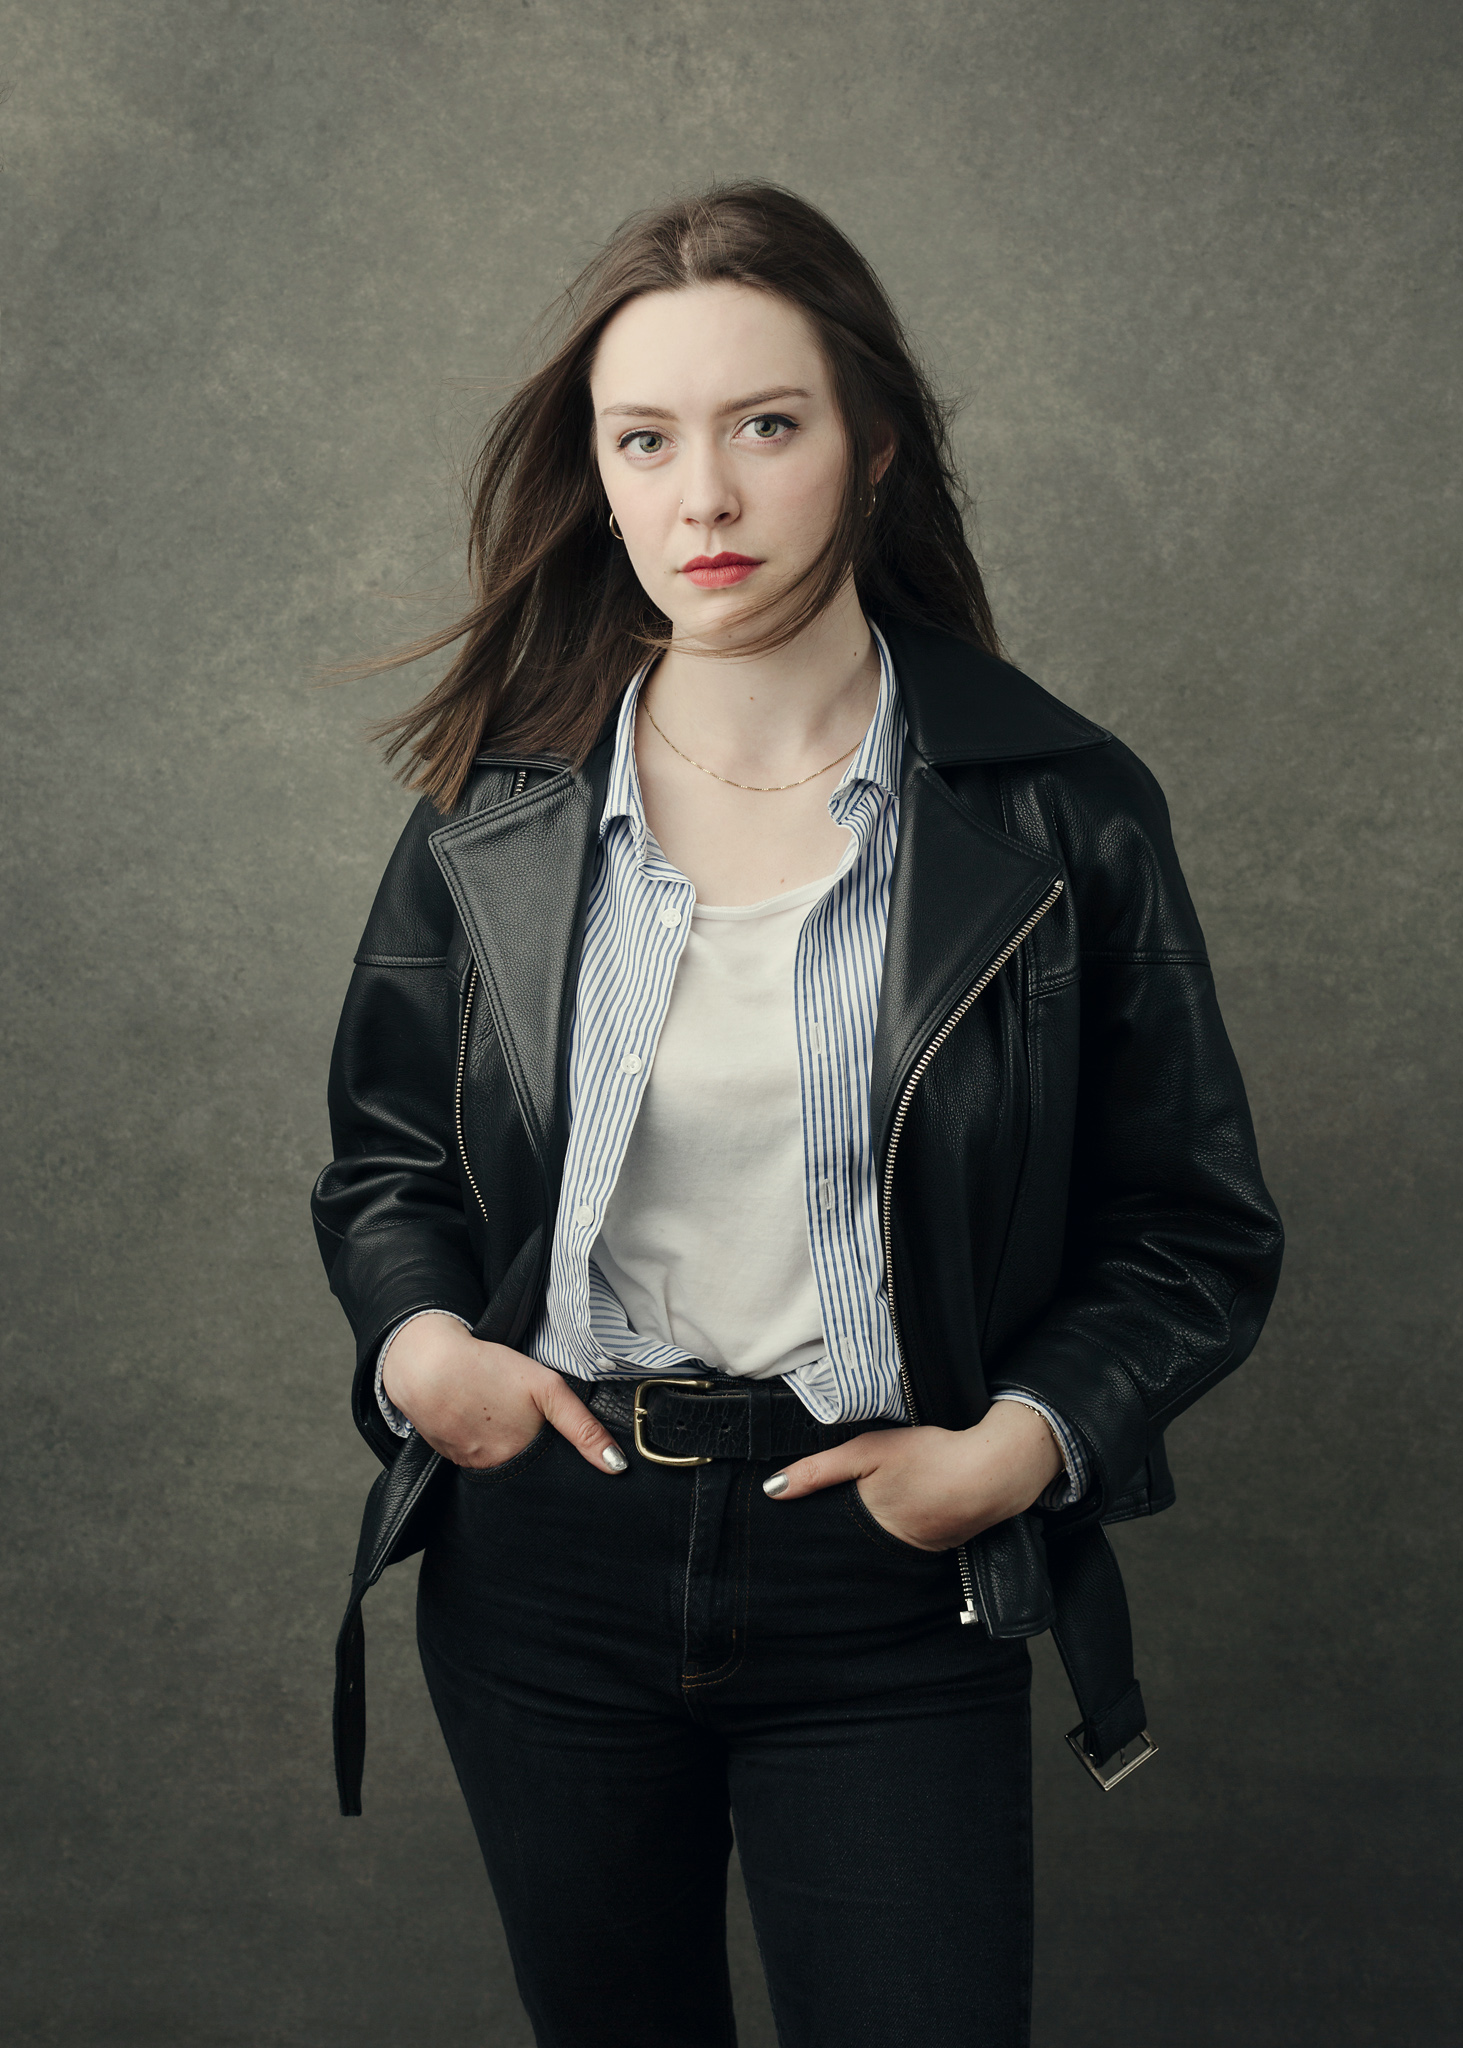 Rosie editorial portrait by David Shoukry